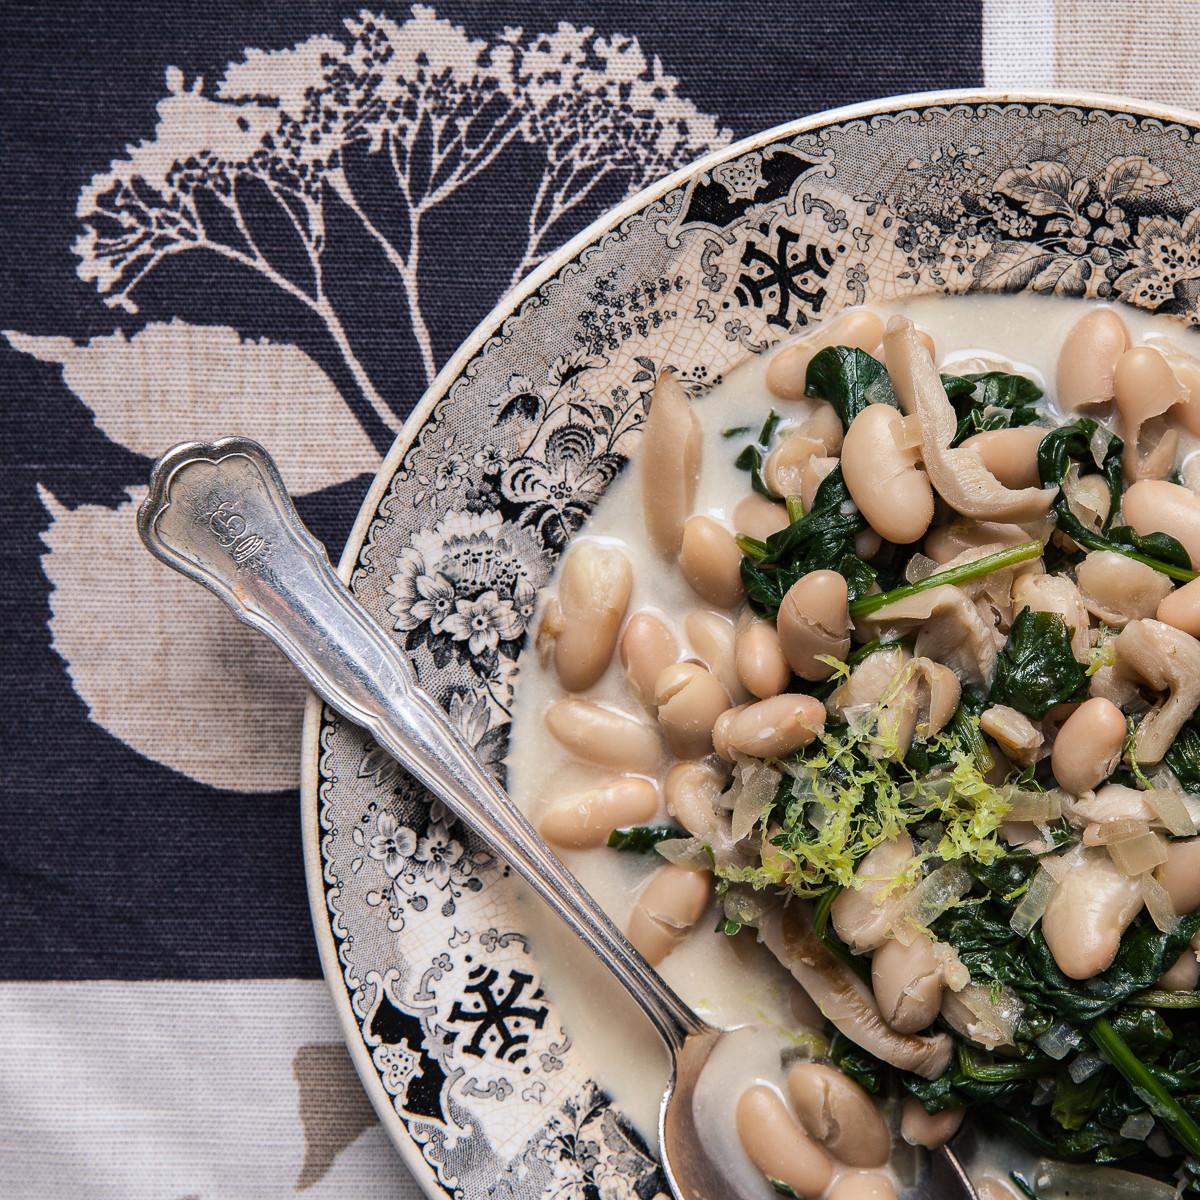 Bohnen – so vielseitig • Valentinas-Kochbuch.de